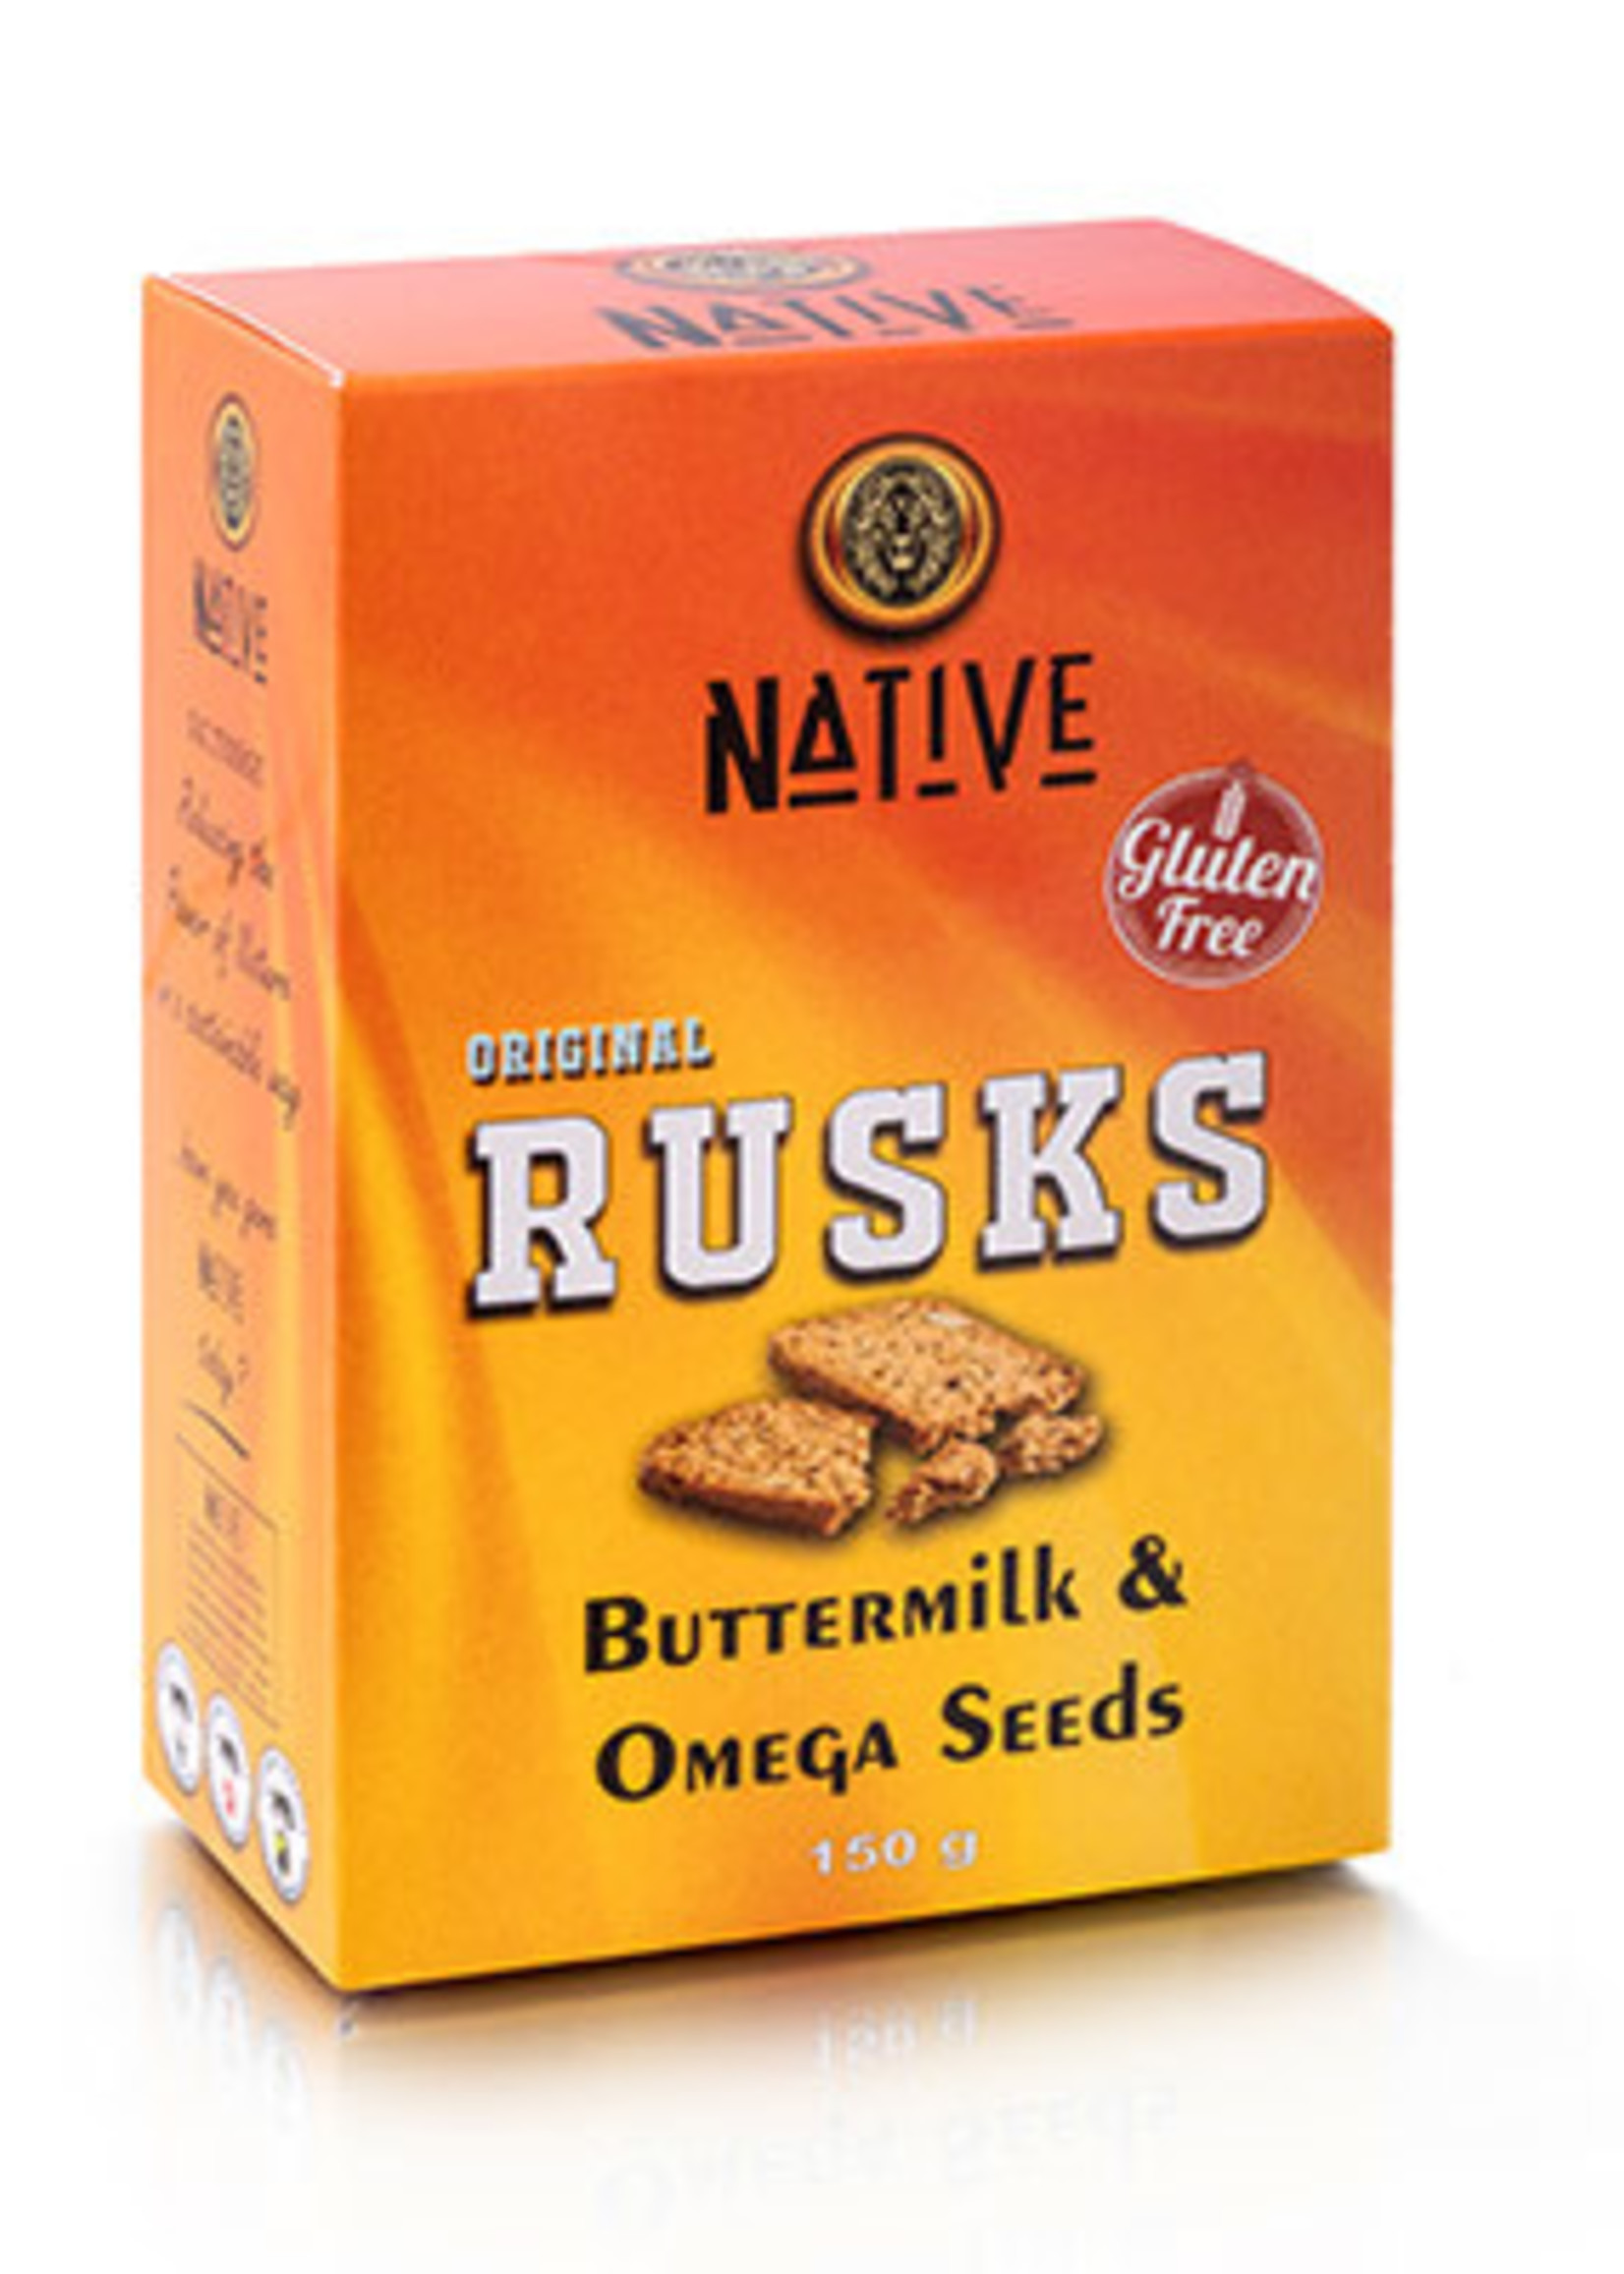 Native Native - Ruskotti- Buttermilk & Omega Seed 150g